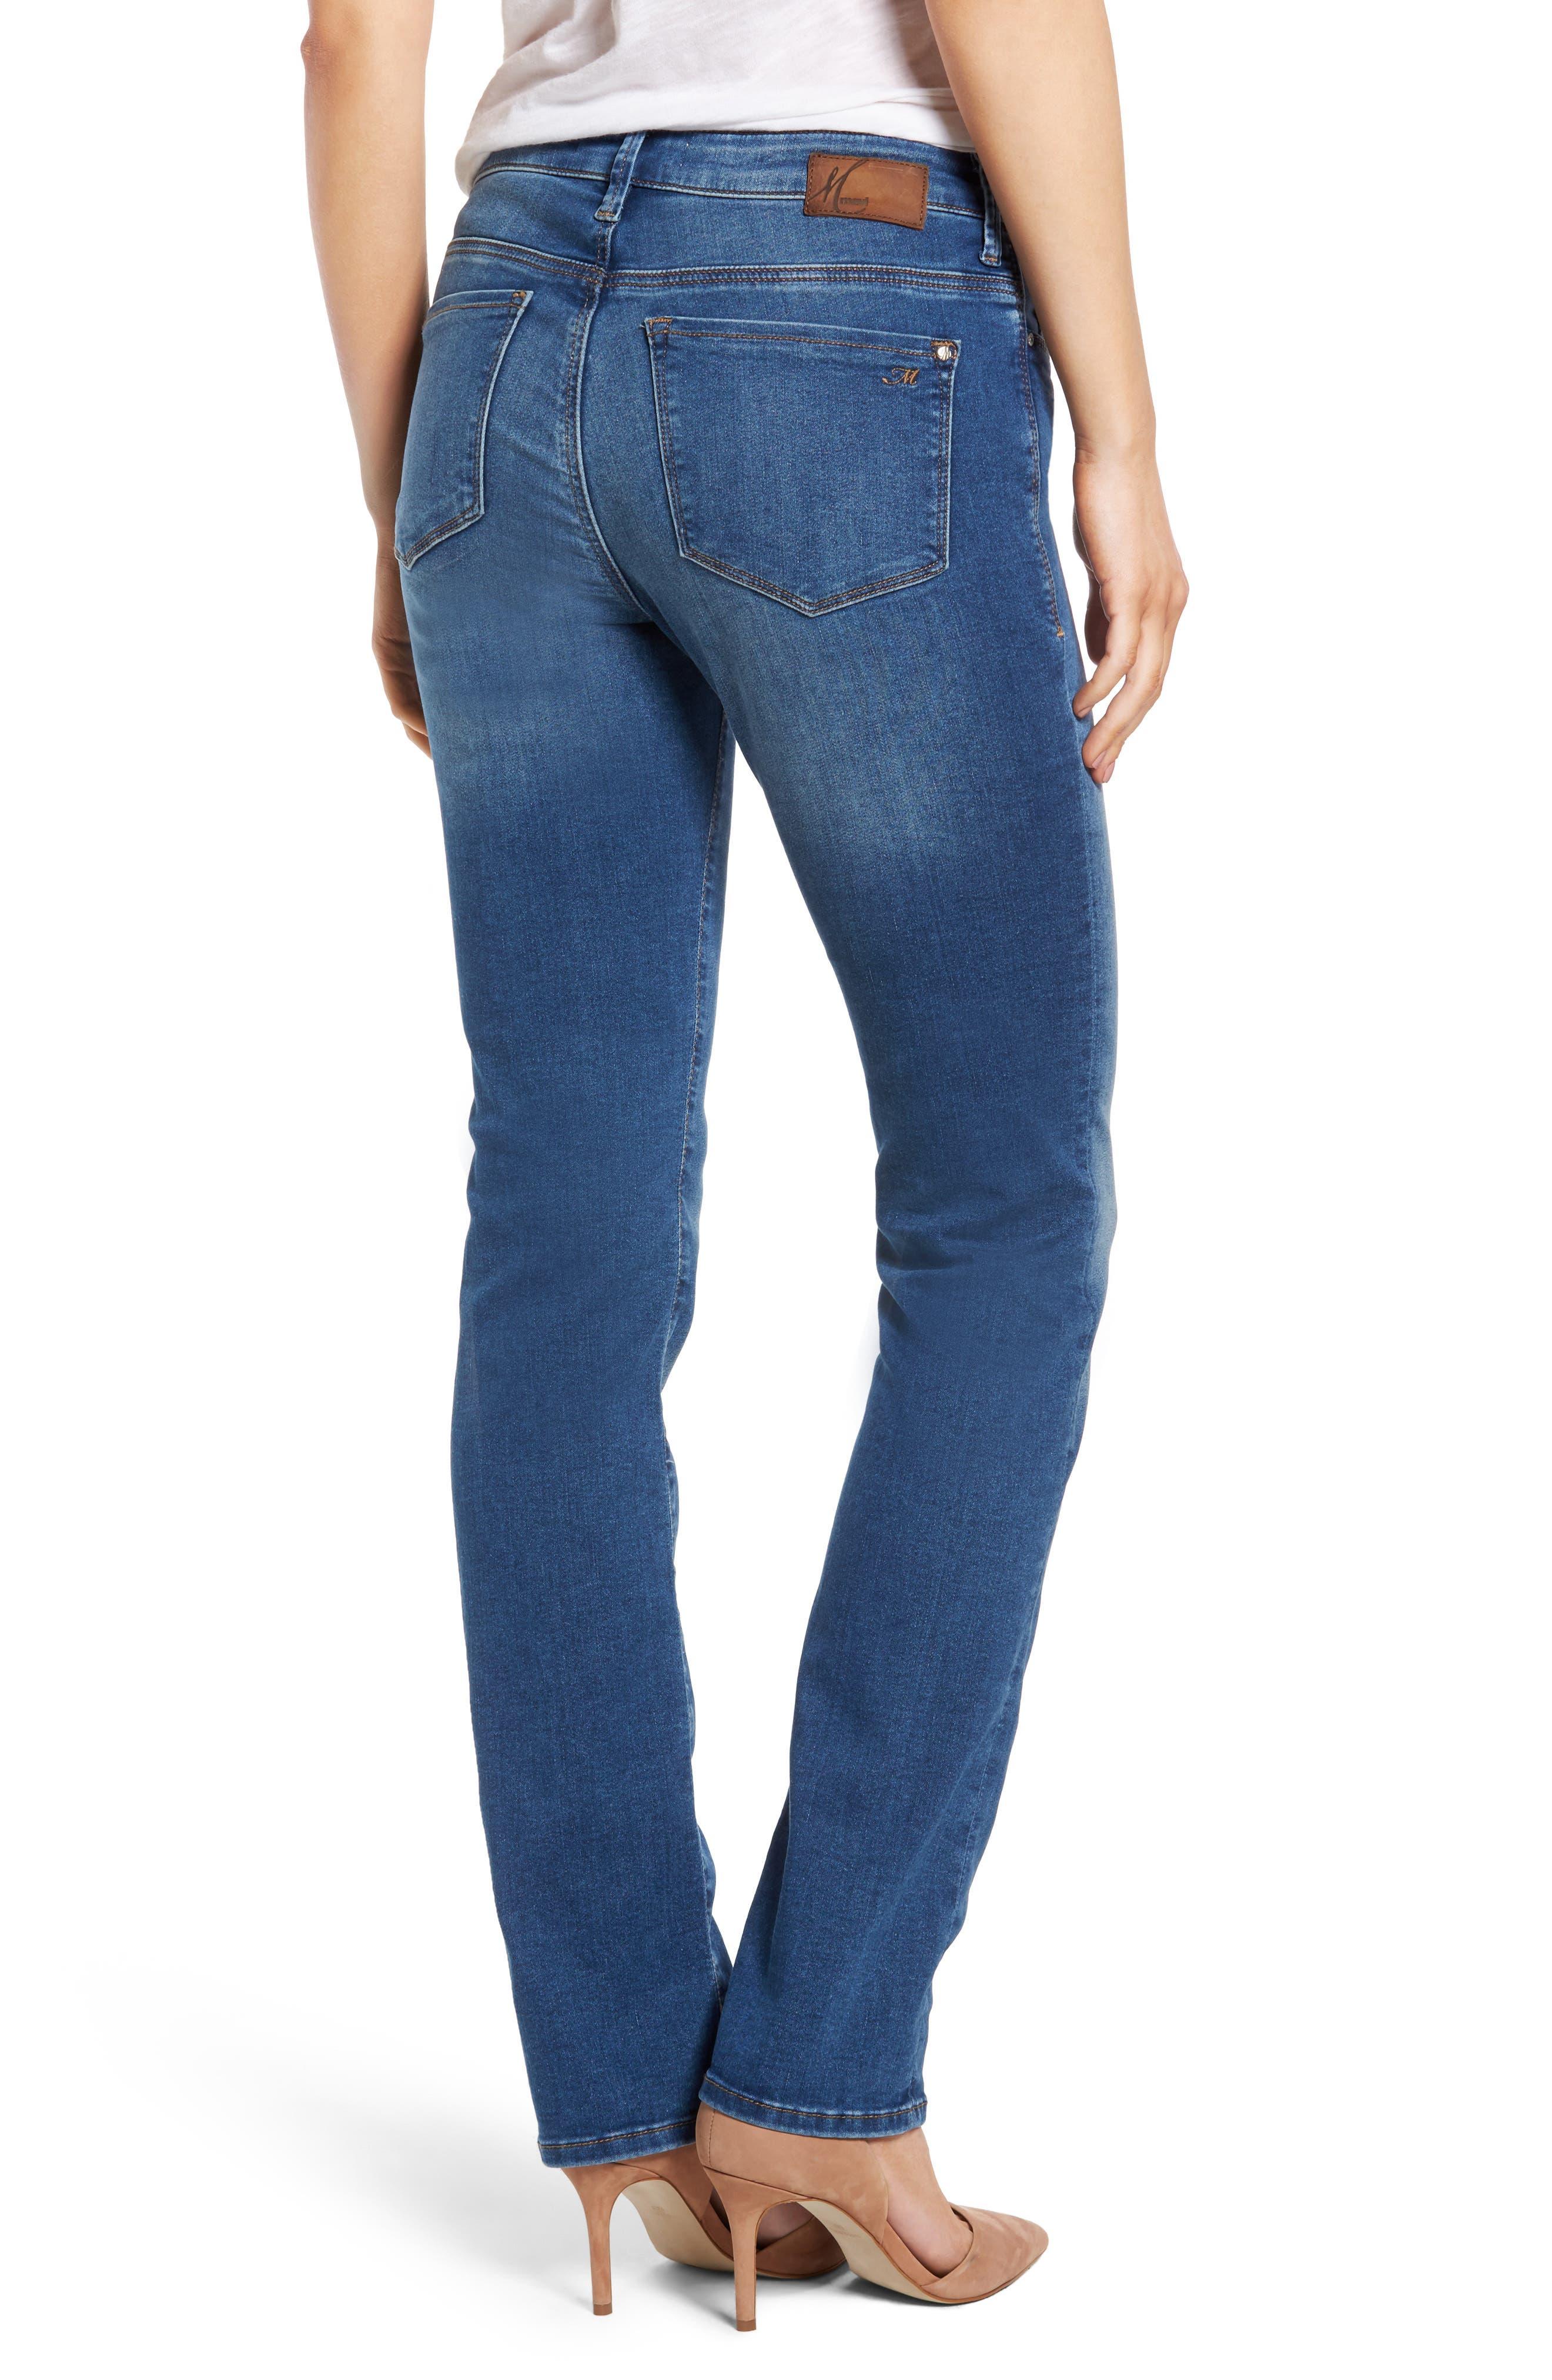 Alternate Image 2  - Mavi Jeans Kendra High Waist Stretch Denim Jeans (Mid Soft Shanti)